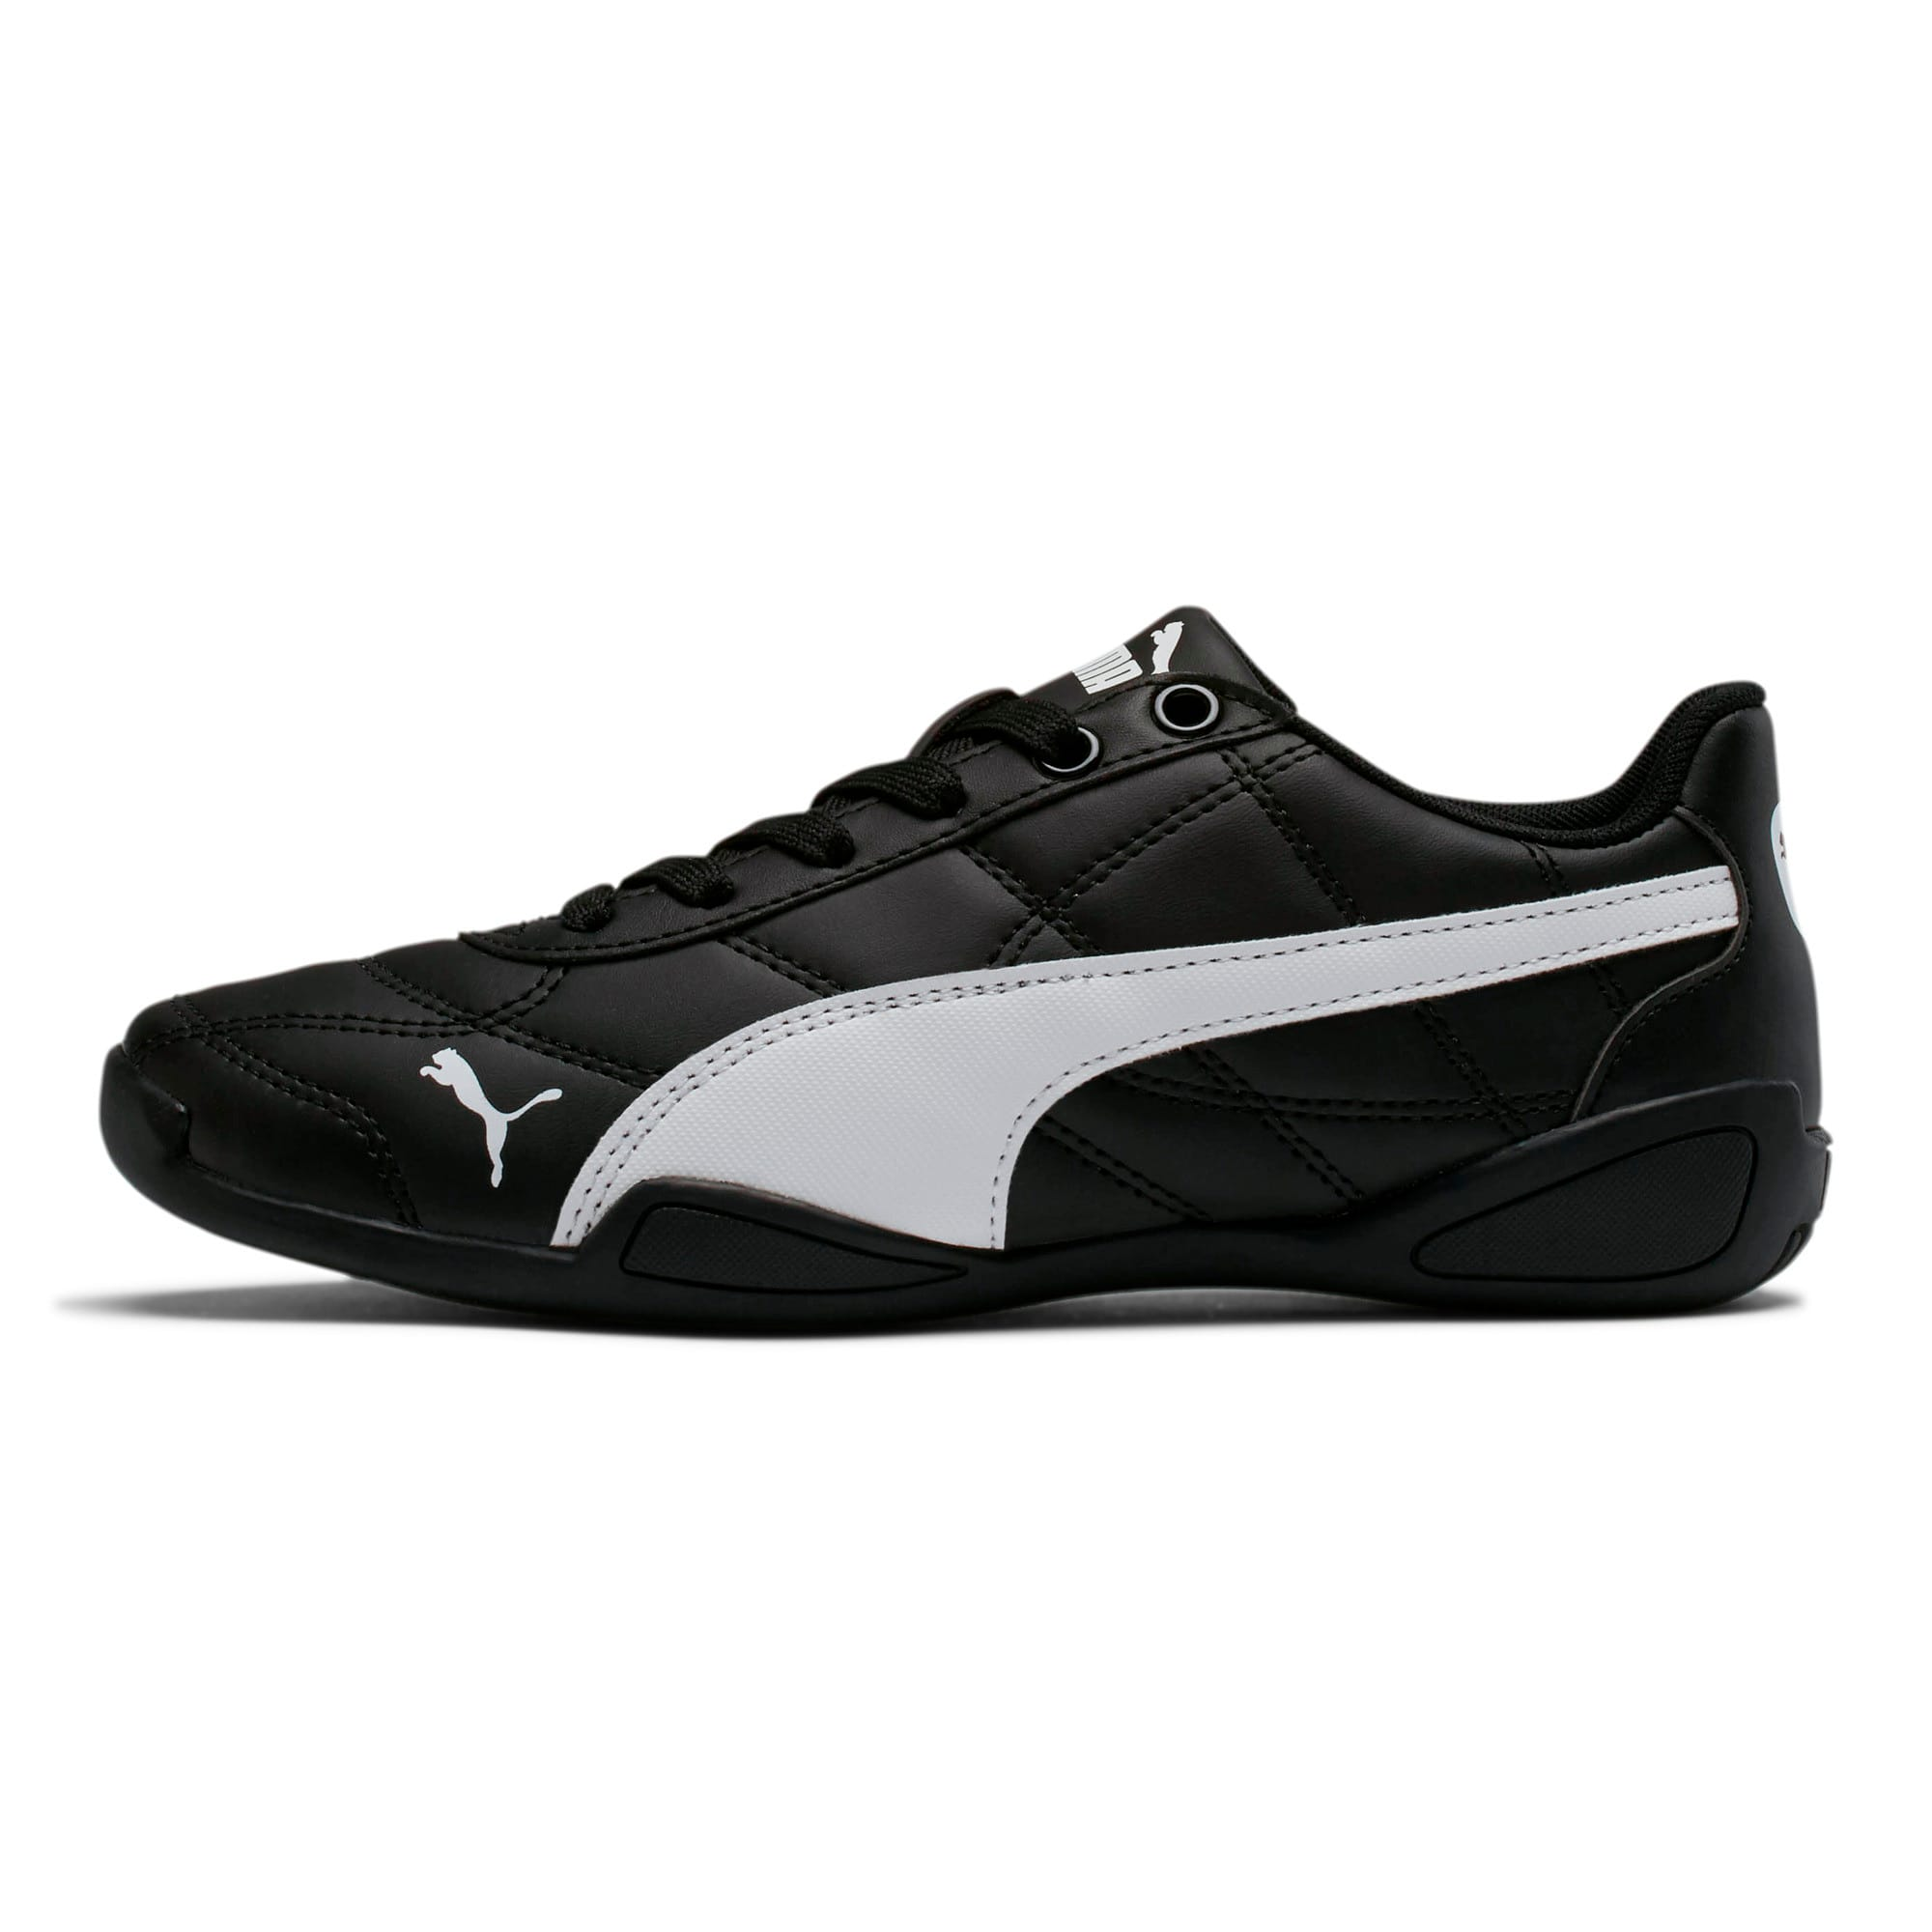 Miniatura 1 de ZapatosTune Cat 3para junior, Puma Black-Puma White, mediano